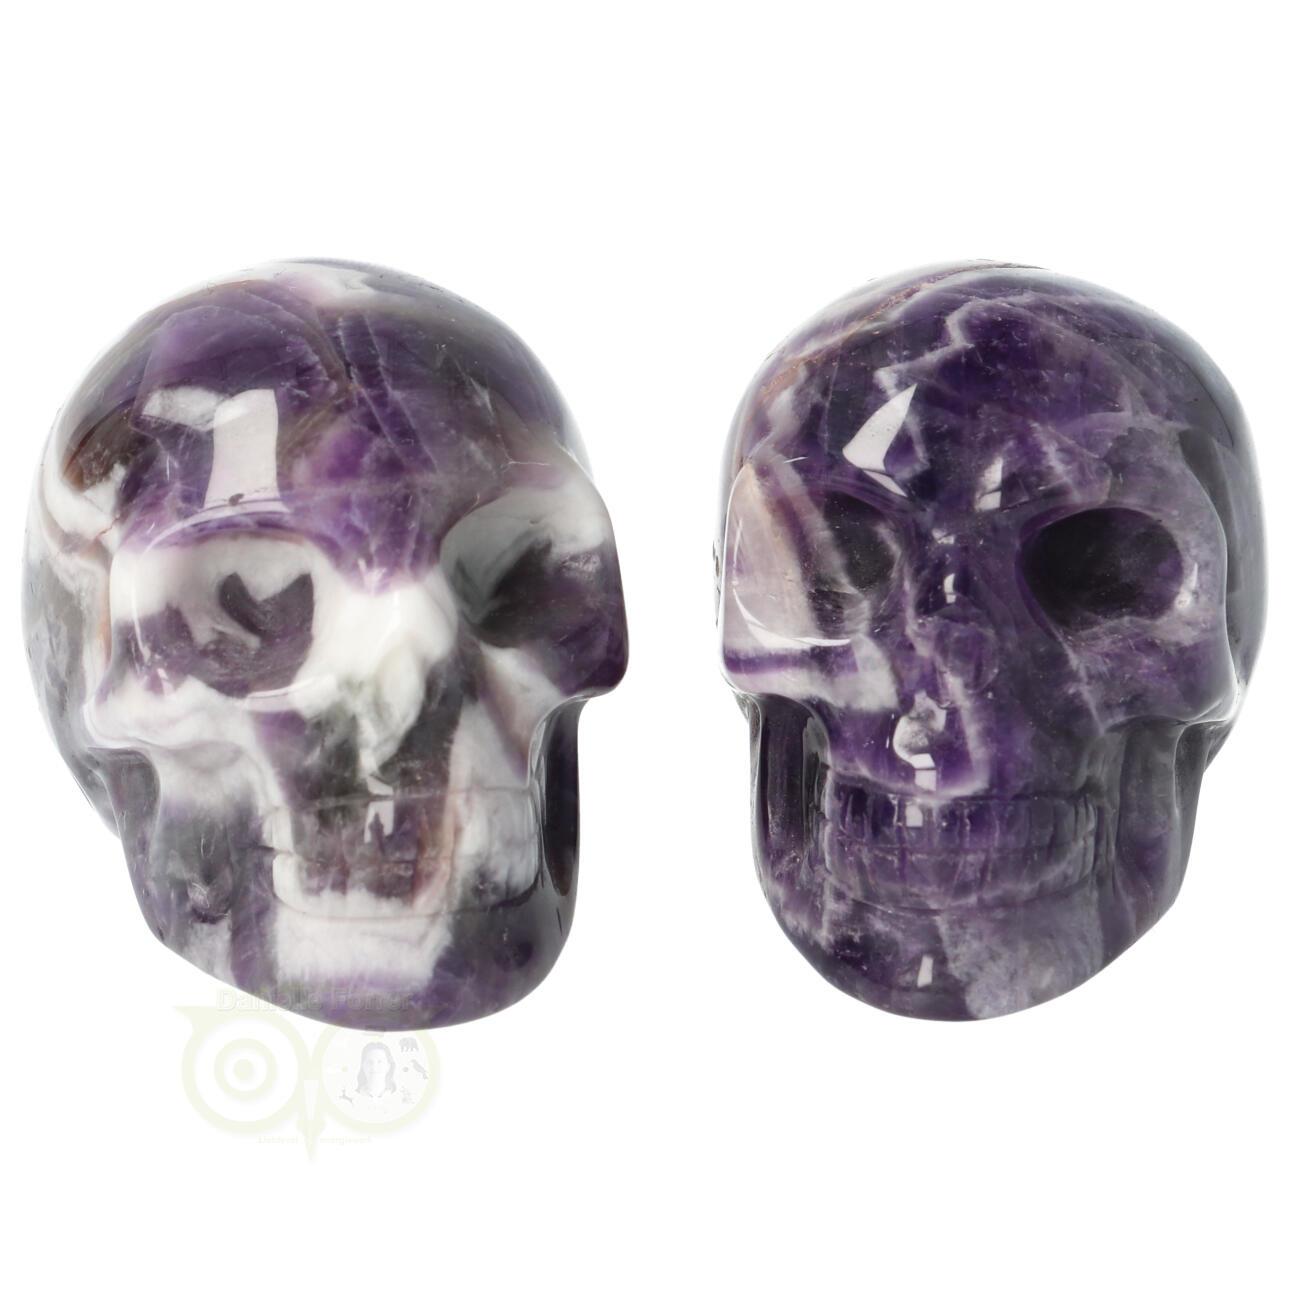 Amethist kristallen schedel - Amethist kleine schedels kopen | Edelstenen Webwinkel - Webshop Danielle Forrer